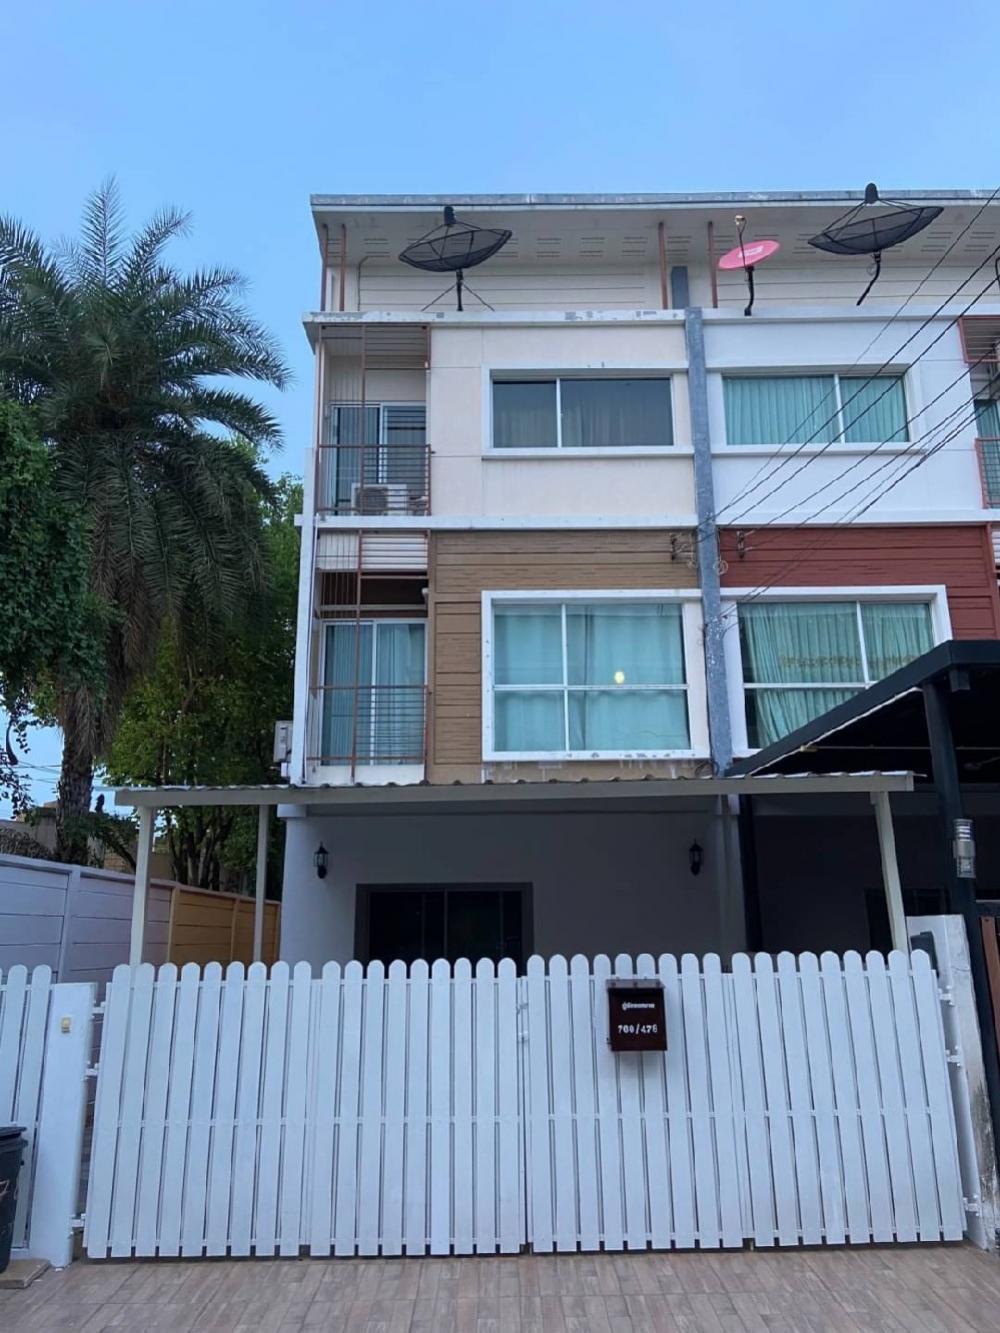 For RentTownhousePattanakan, Srinakarin : Town home rent 27,000b moth  village city - 3 bed 3bath 2 livngroomswimming pool gym gardenCall 0938563451 k.noey